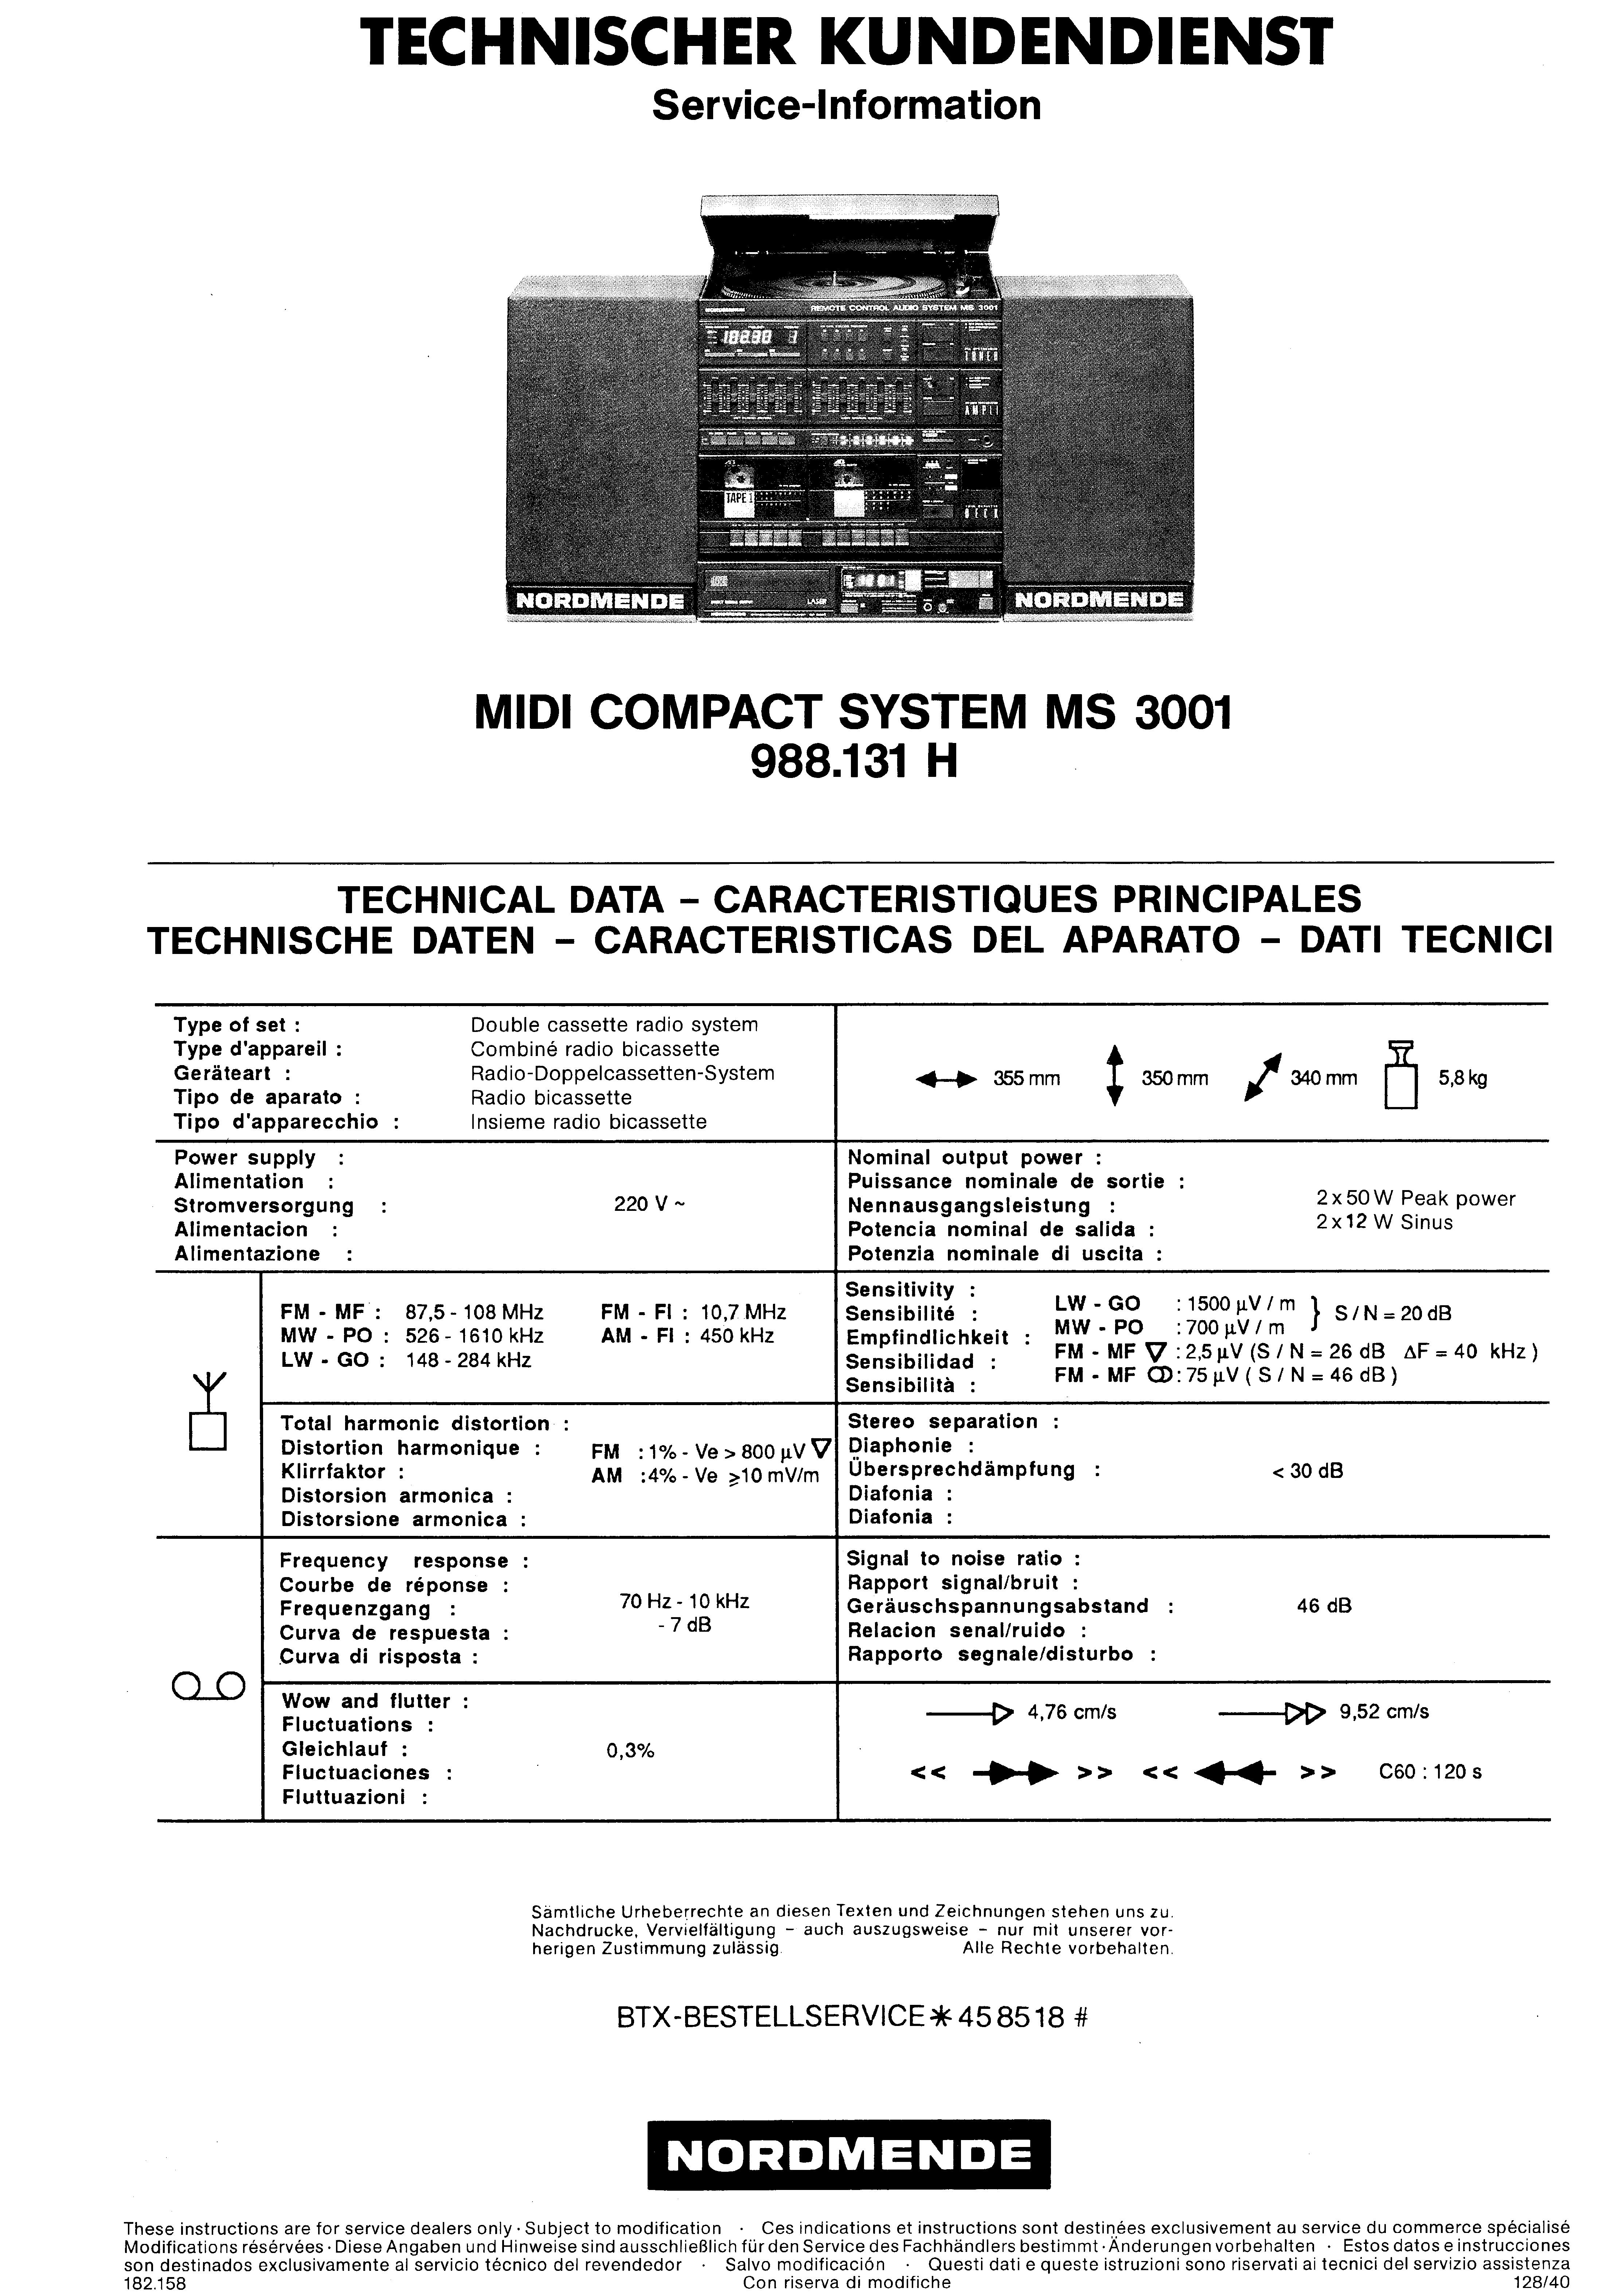 NORDMENDE MIDI COMPACT SYSTEM MS 3001 988 131H SM Service Manual